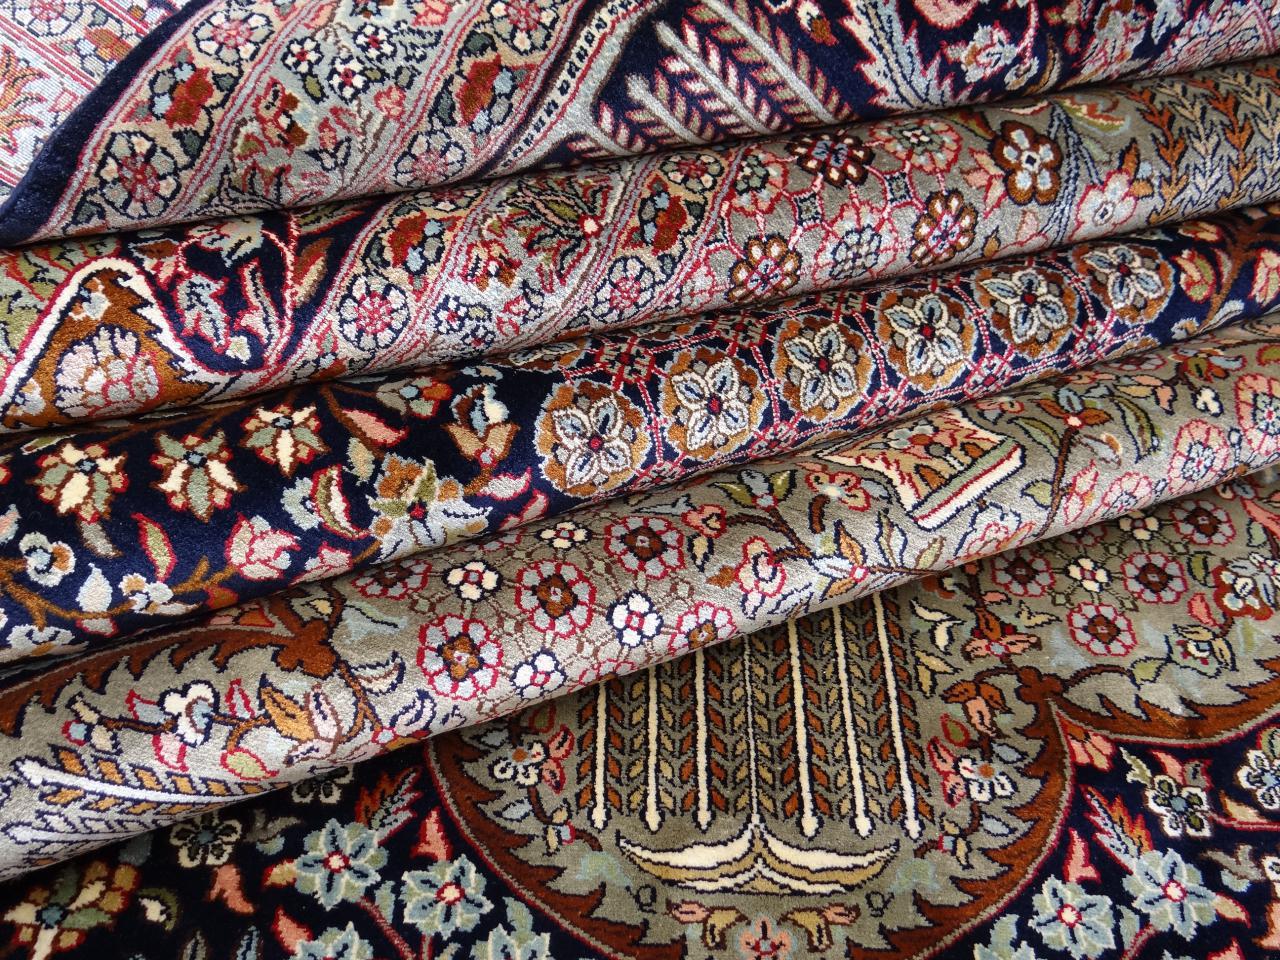 srinagar soie extra fin tapis prestigieux n 1443 374x277cm. Black Bedroom Furniture Sets. Home Design Ideas